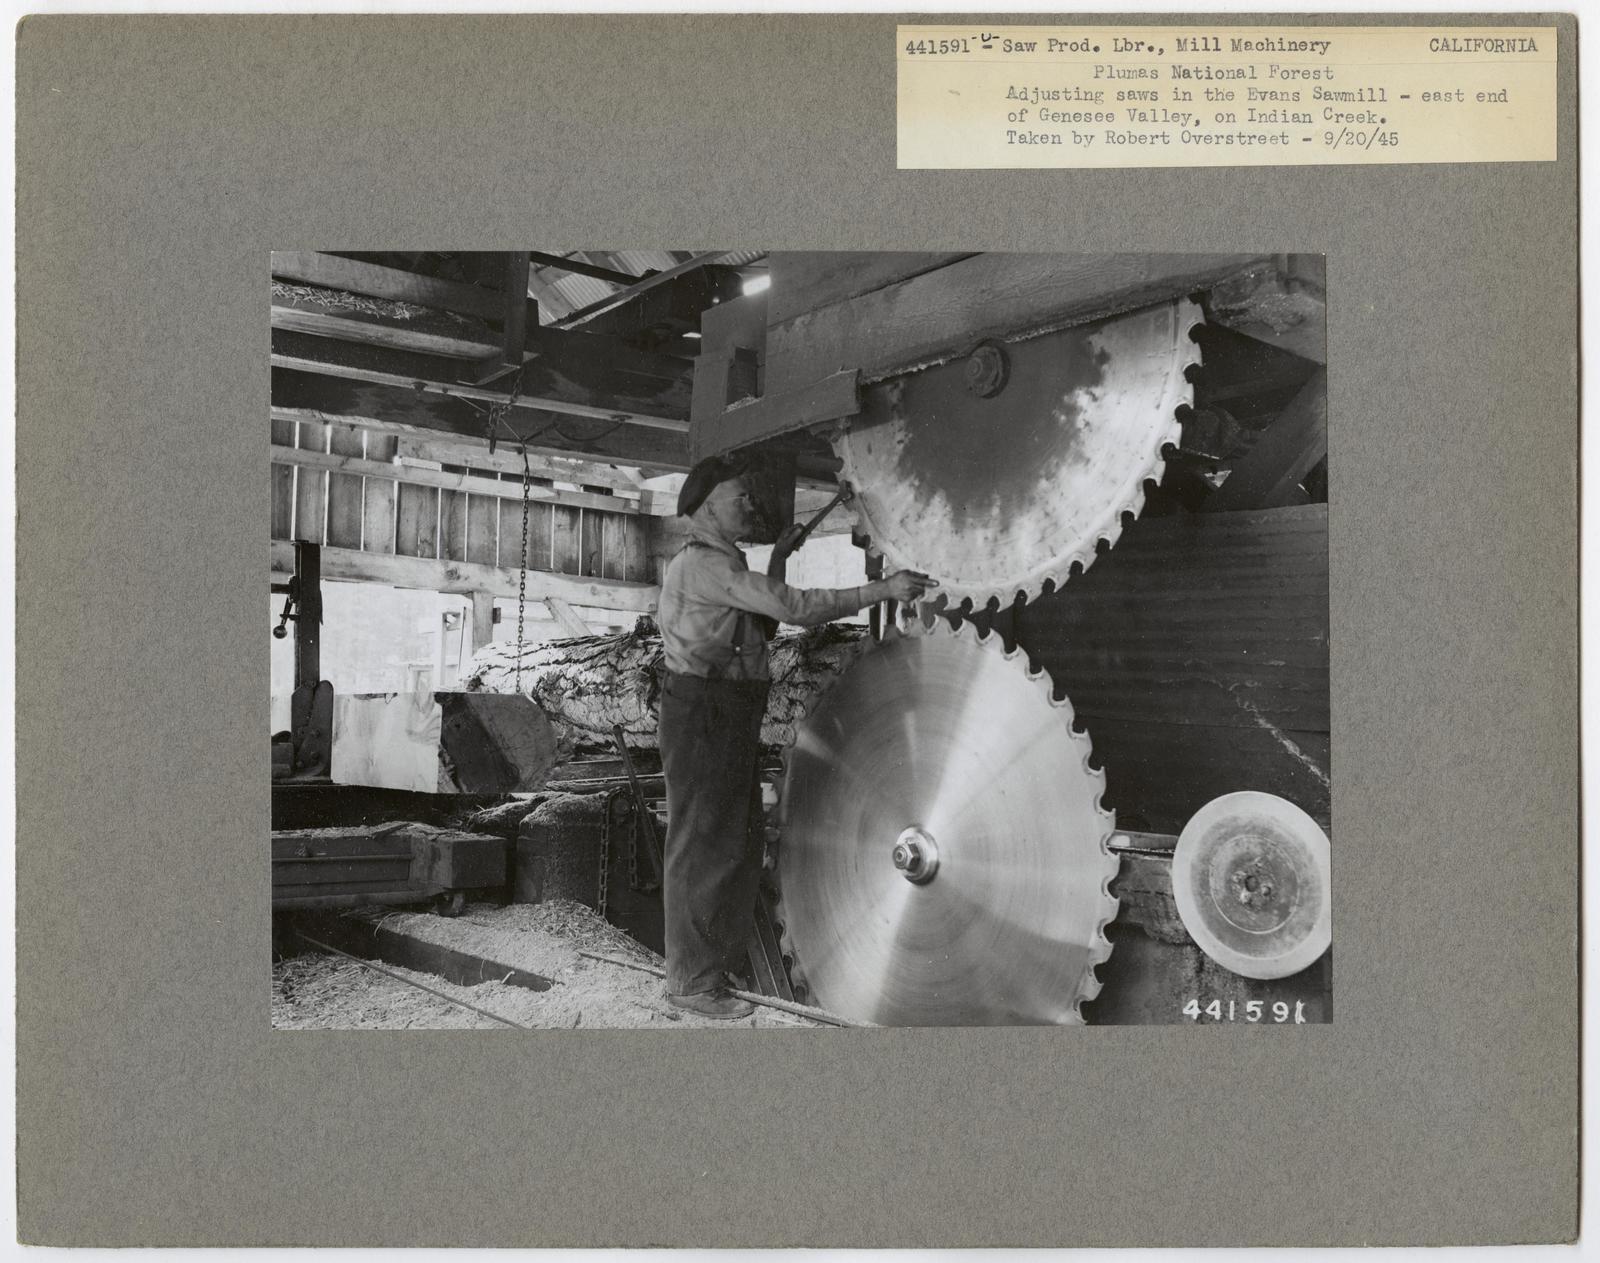 Sawmill Interiors - California